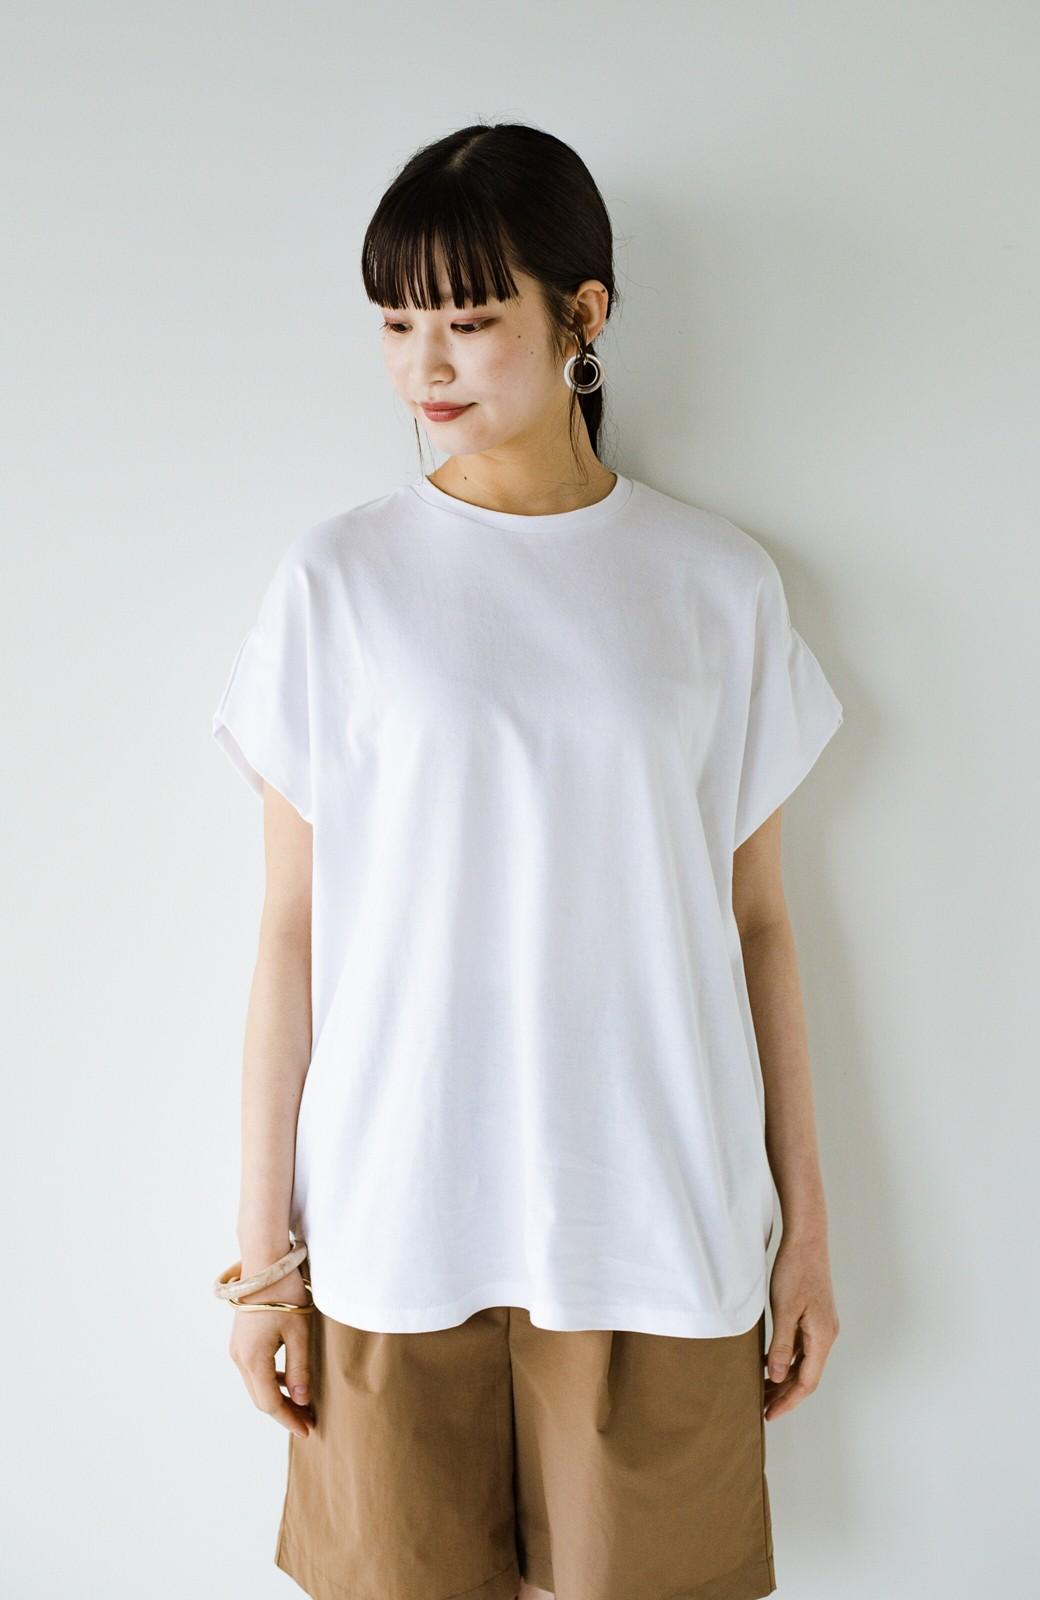 haco! PBPオーガニックコットン 楽ちんなのにブラウス気分で着られる大人のおめかしTシャツ <ホワイト>の商品写真3